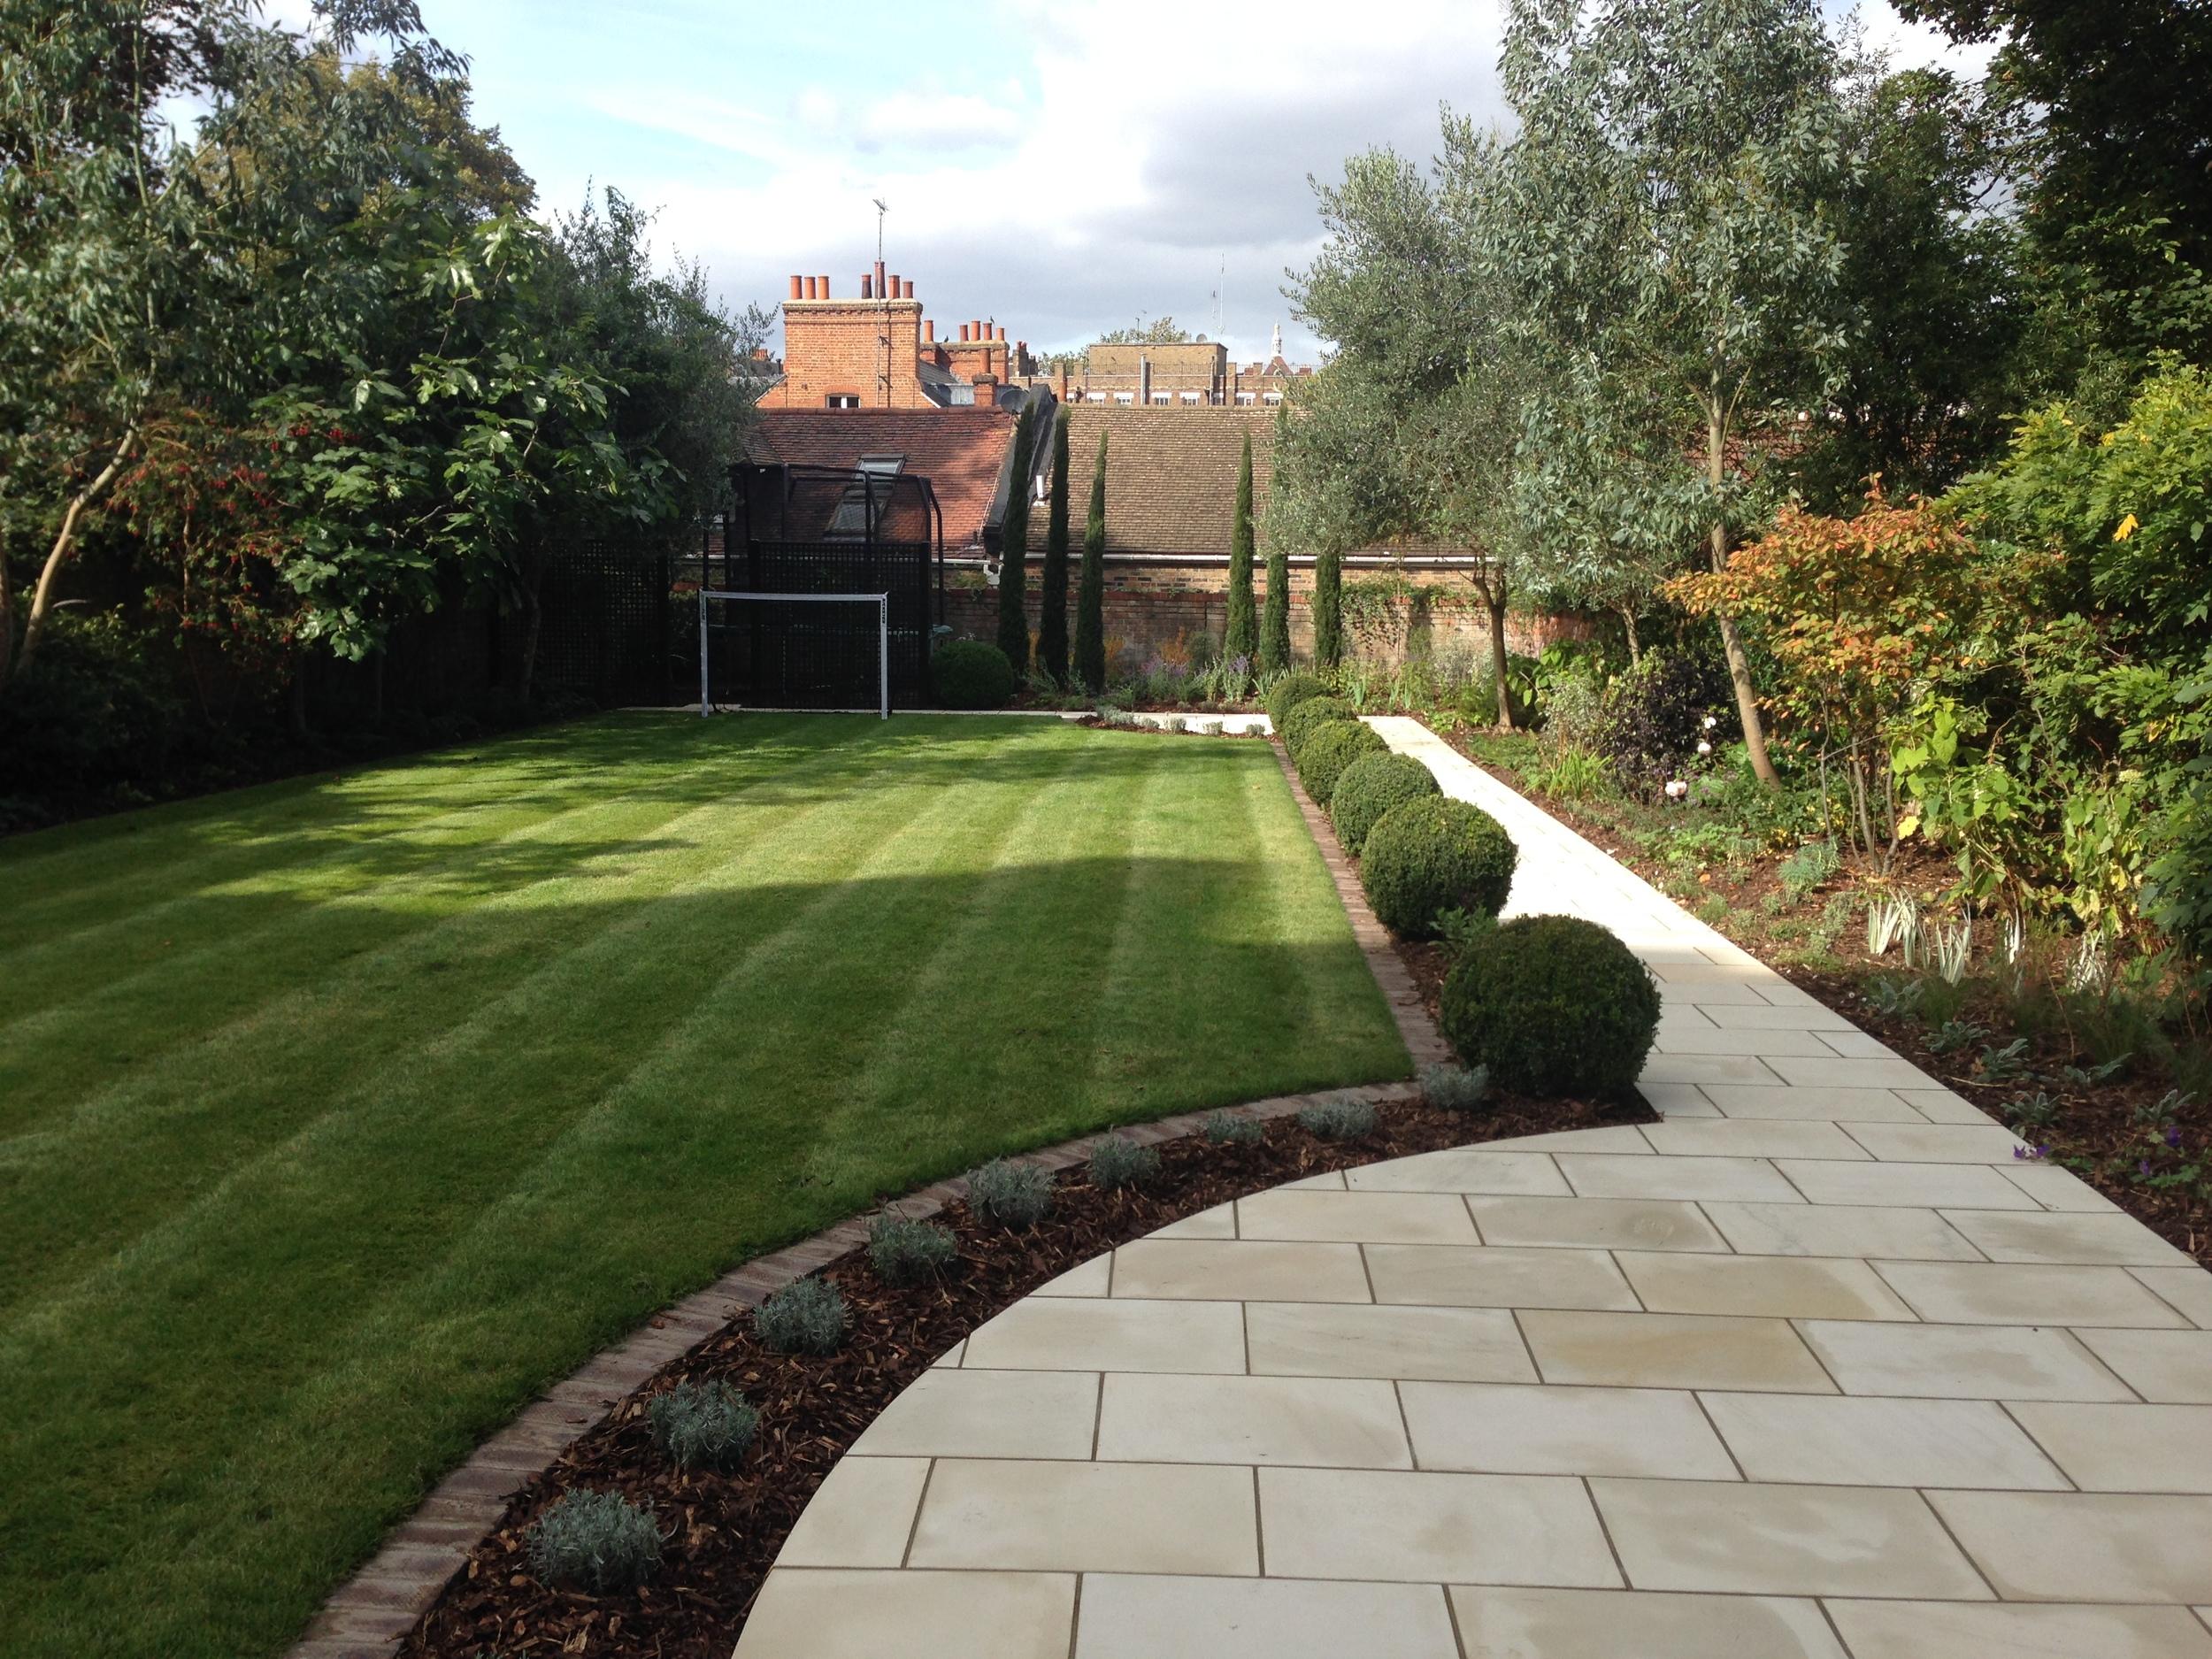 Family-garden-design.-1 100+ Surprising Garden Design Ideas You Should Not Miss in 2021